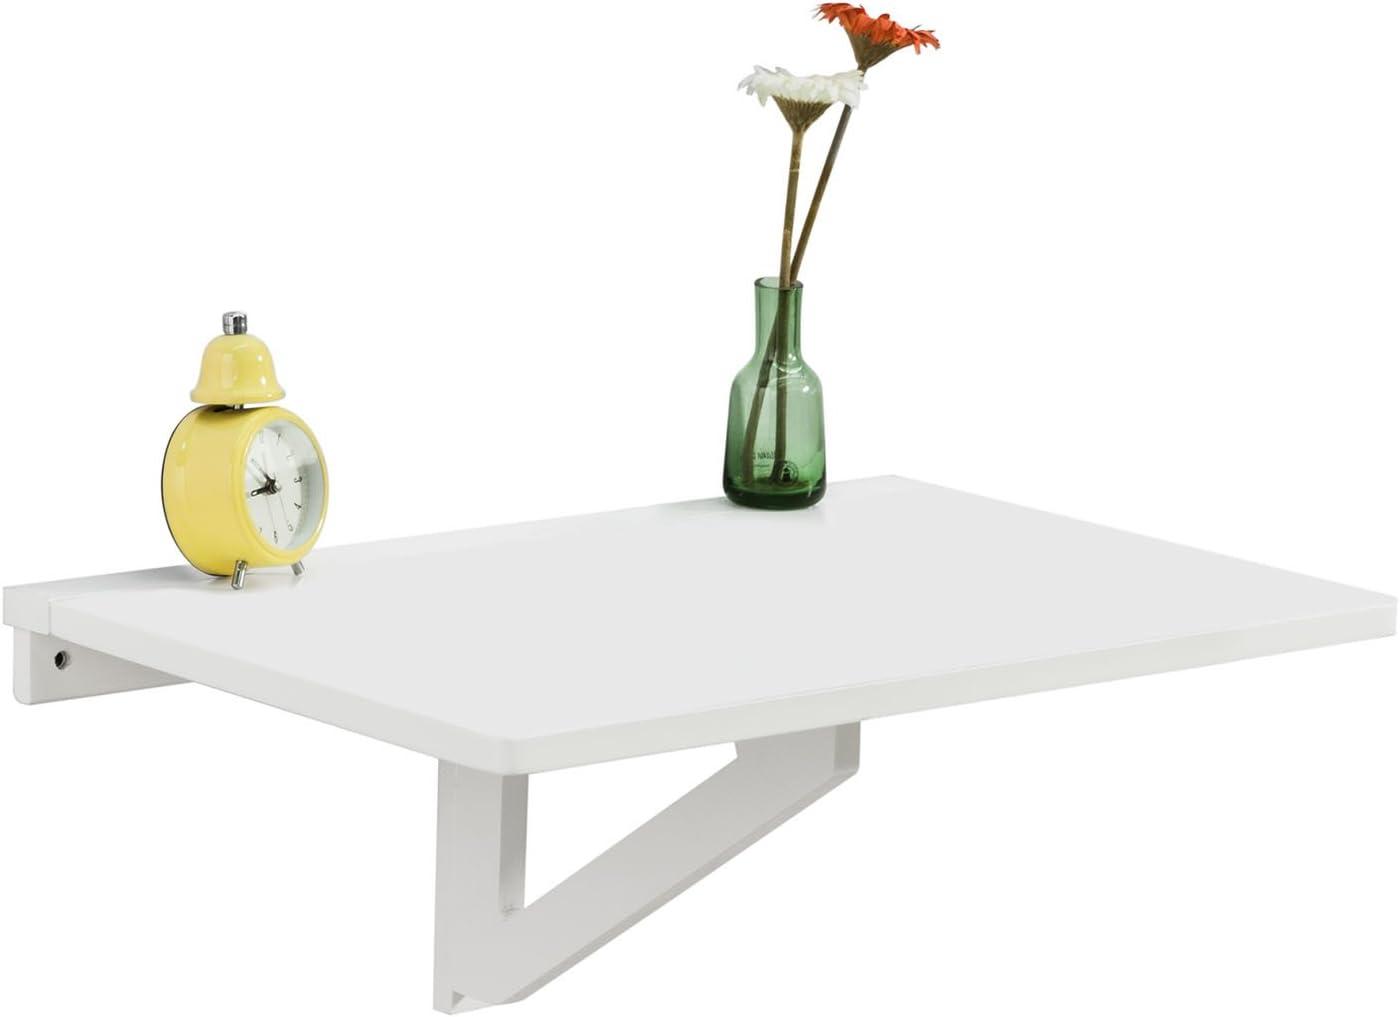 SoBuy FWT03-W, Mesa Plegable de Pared,Mueble Infantil,Mesa para portátil, Mesa para Comer, Escritorio,ES